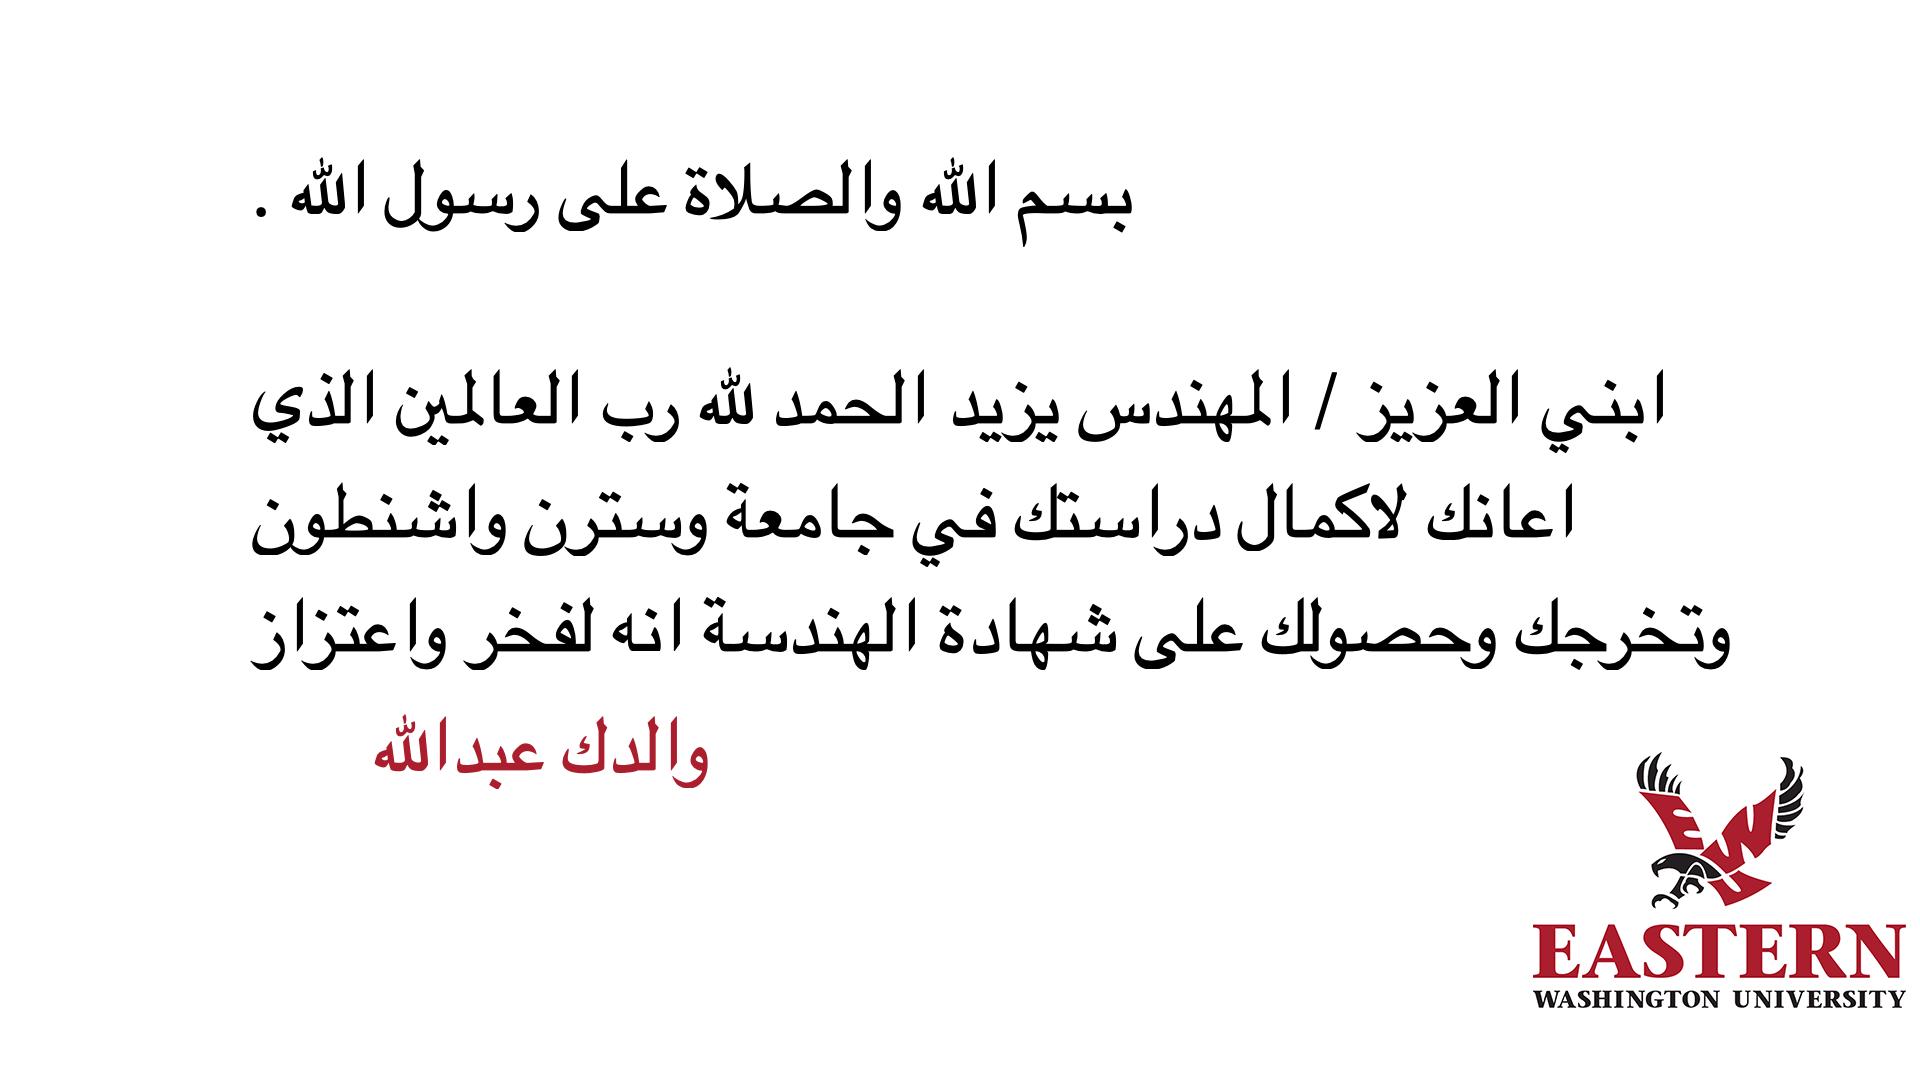 tbi_yazid-abdullah-a-alghafis_5064.png